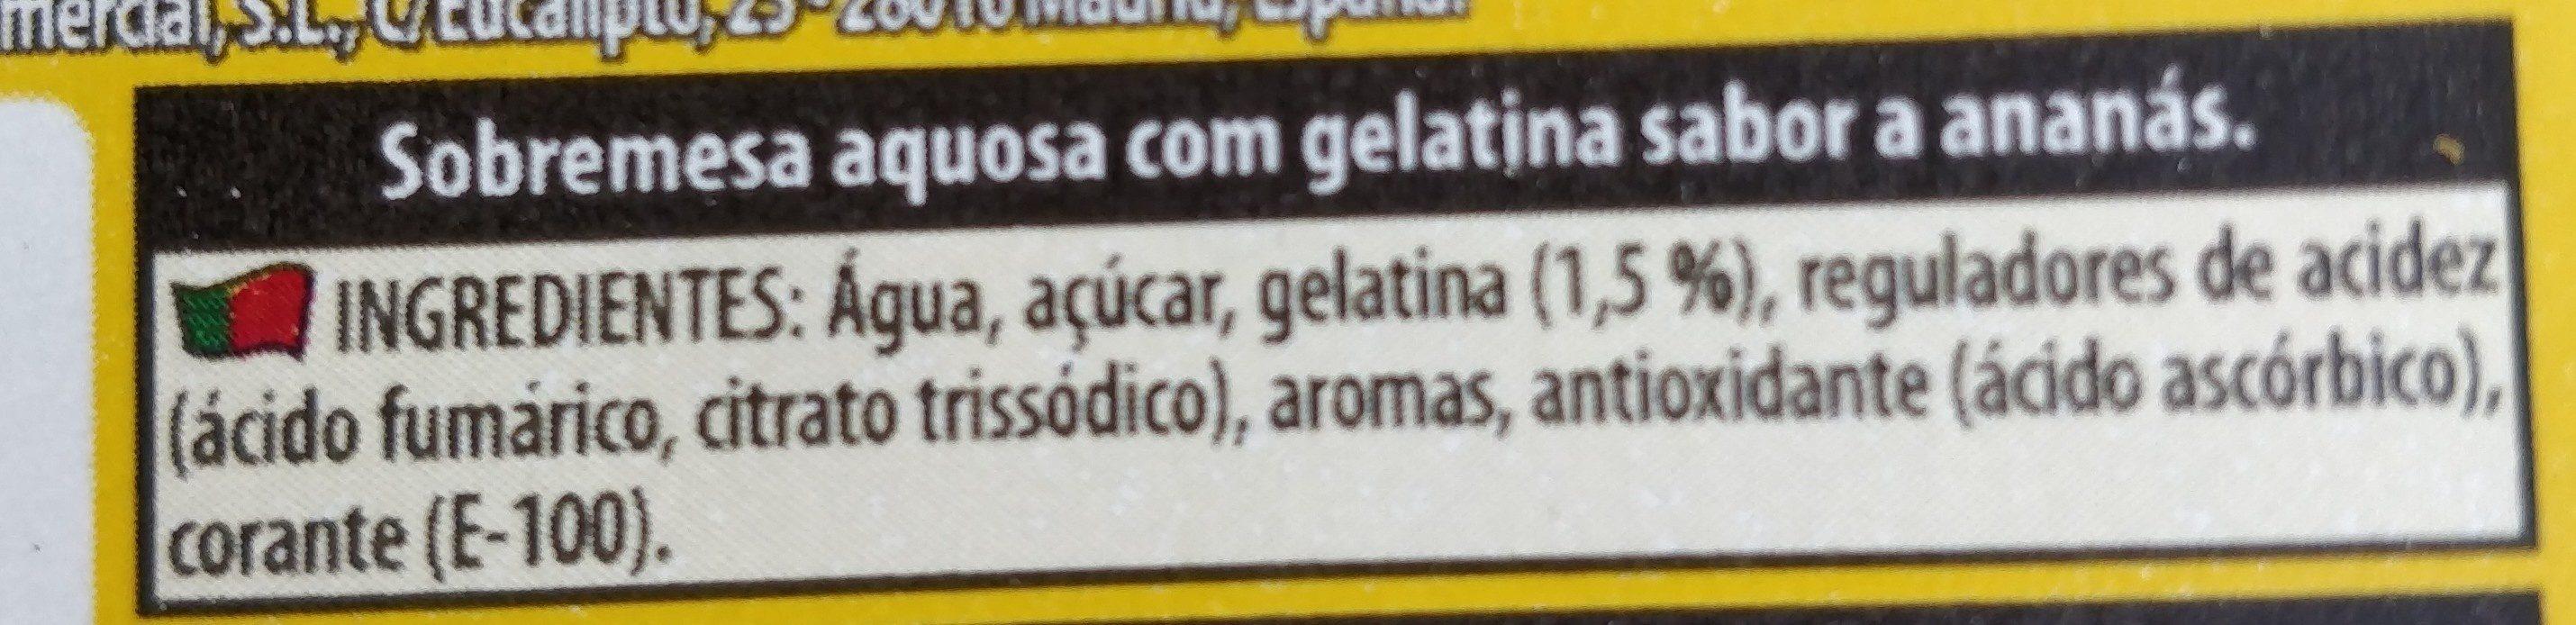 Gelatina Sabor Ananás - Ingrédients - fr